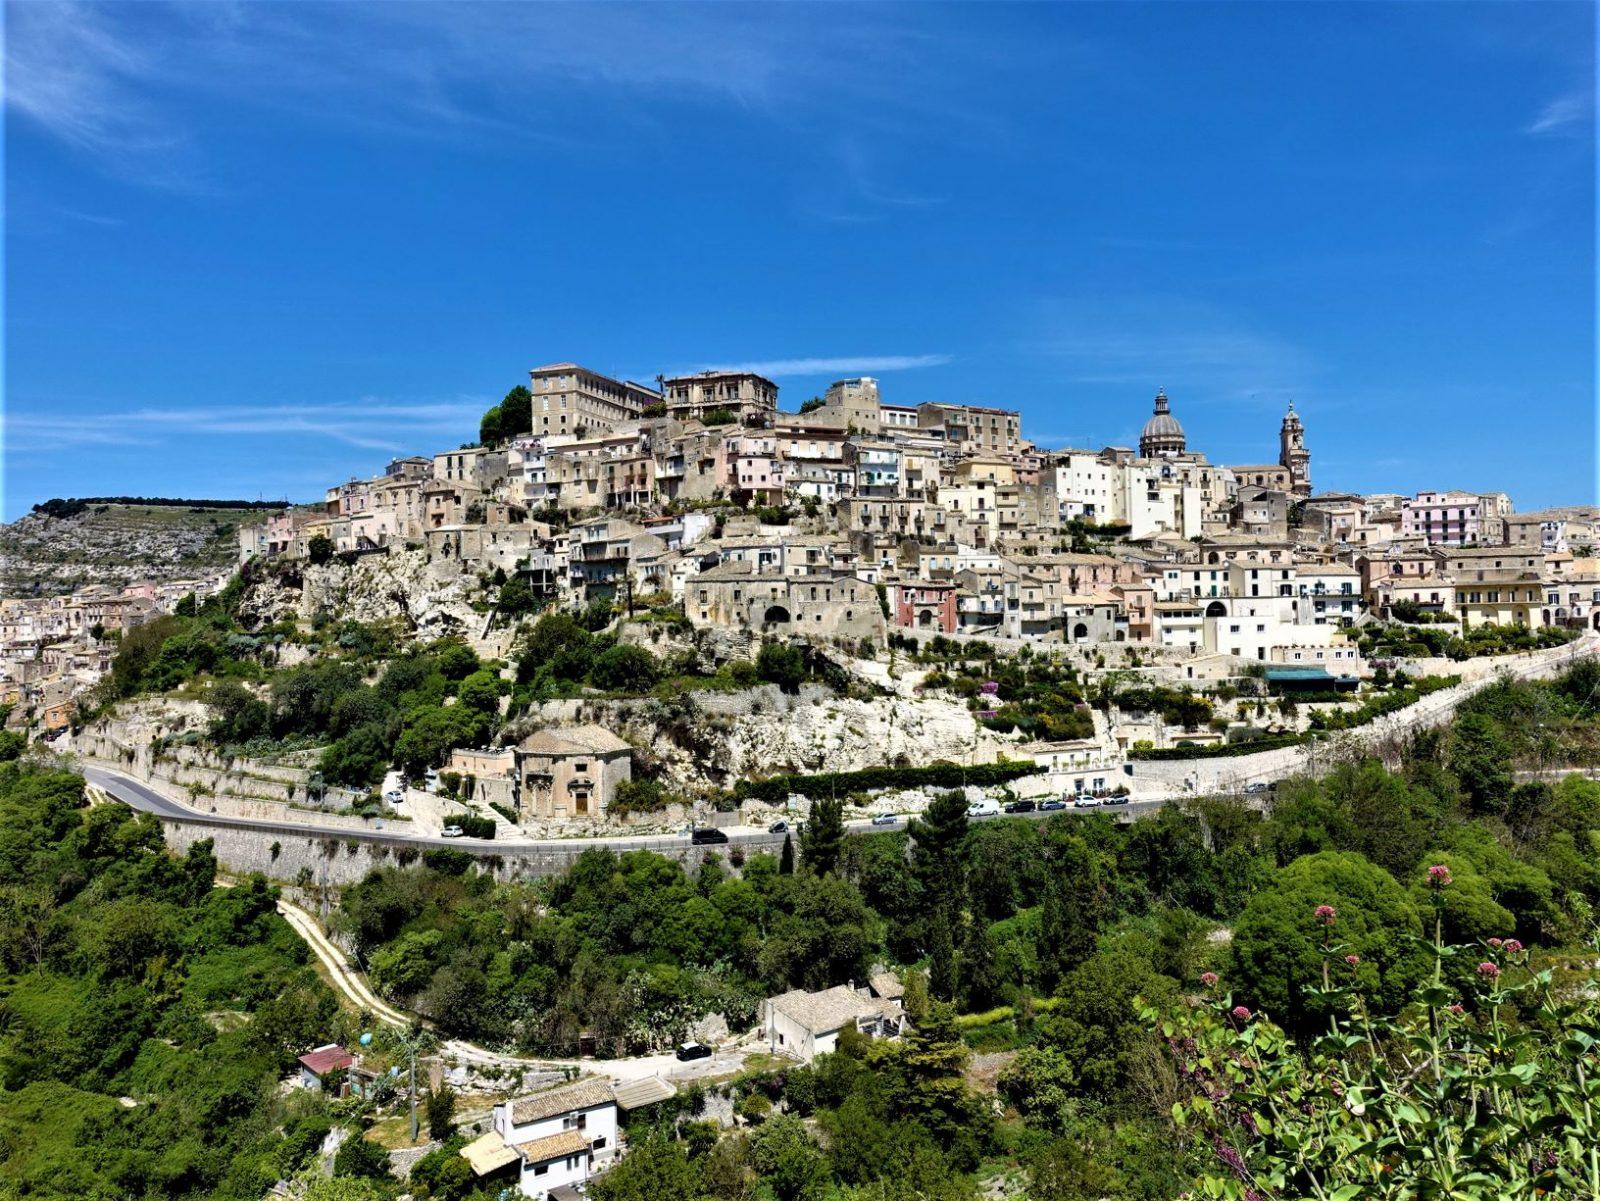 Ragusa står på UNESCOS verdensarveliste Sicilia